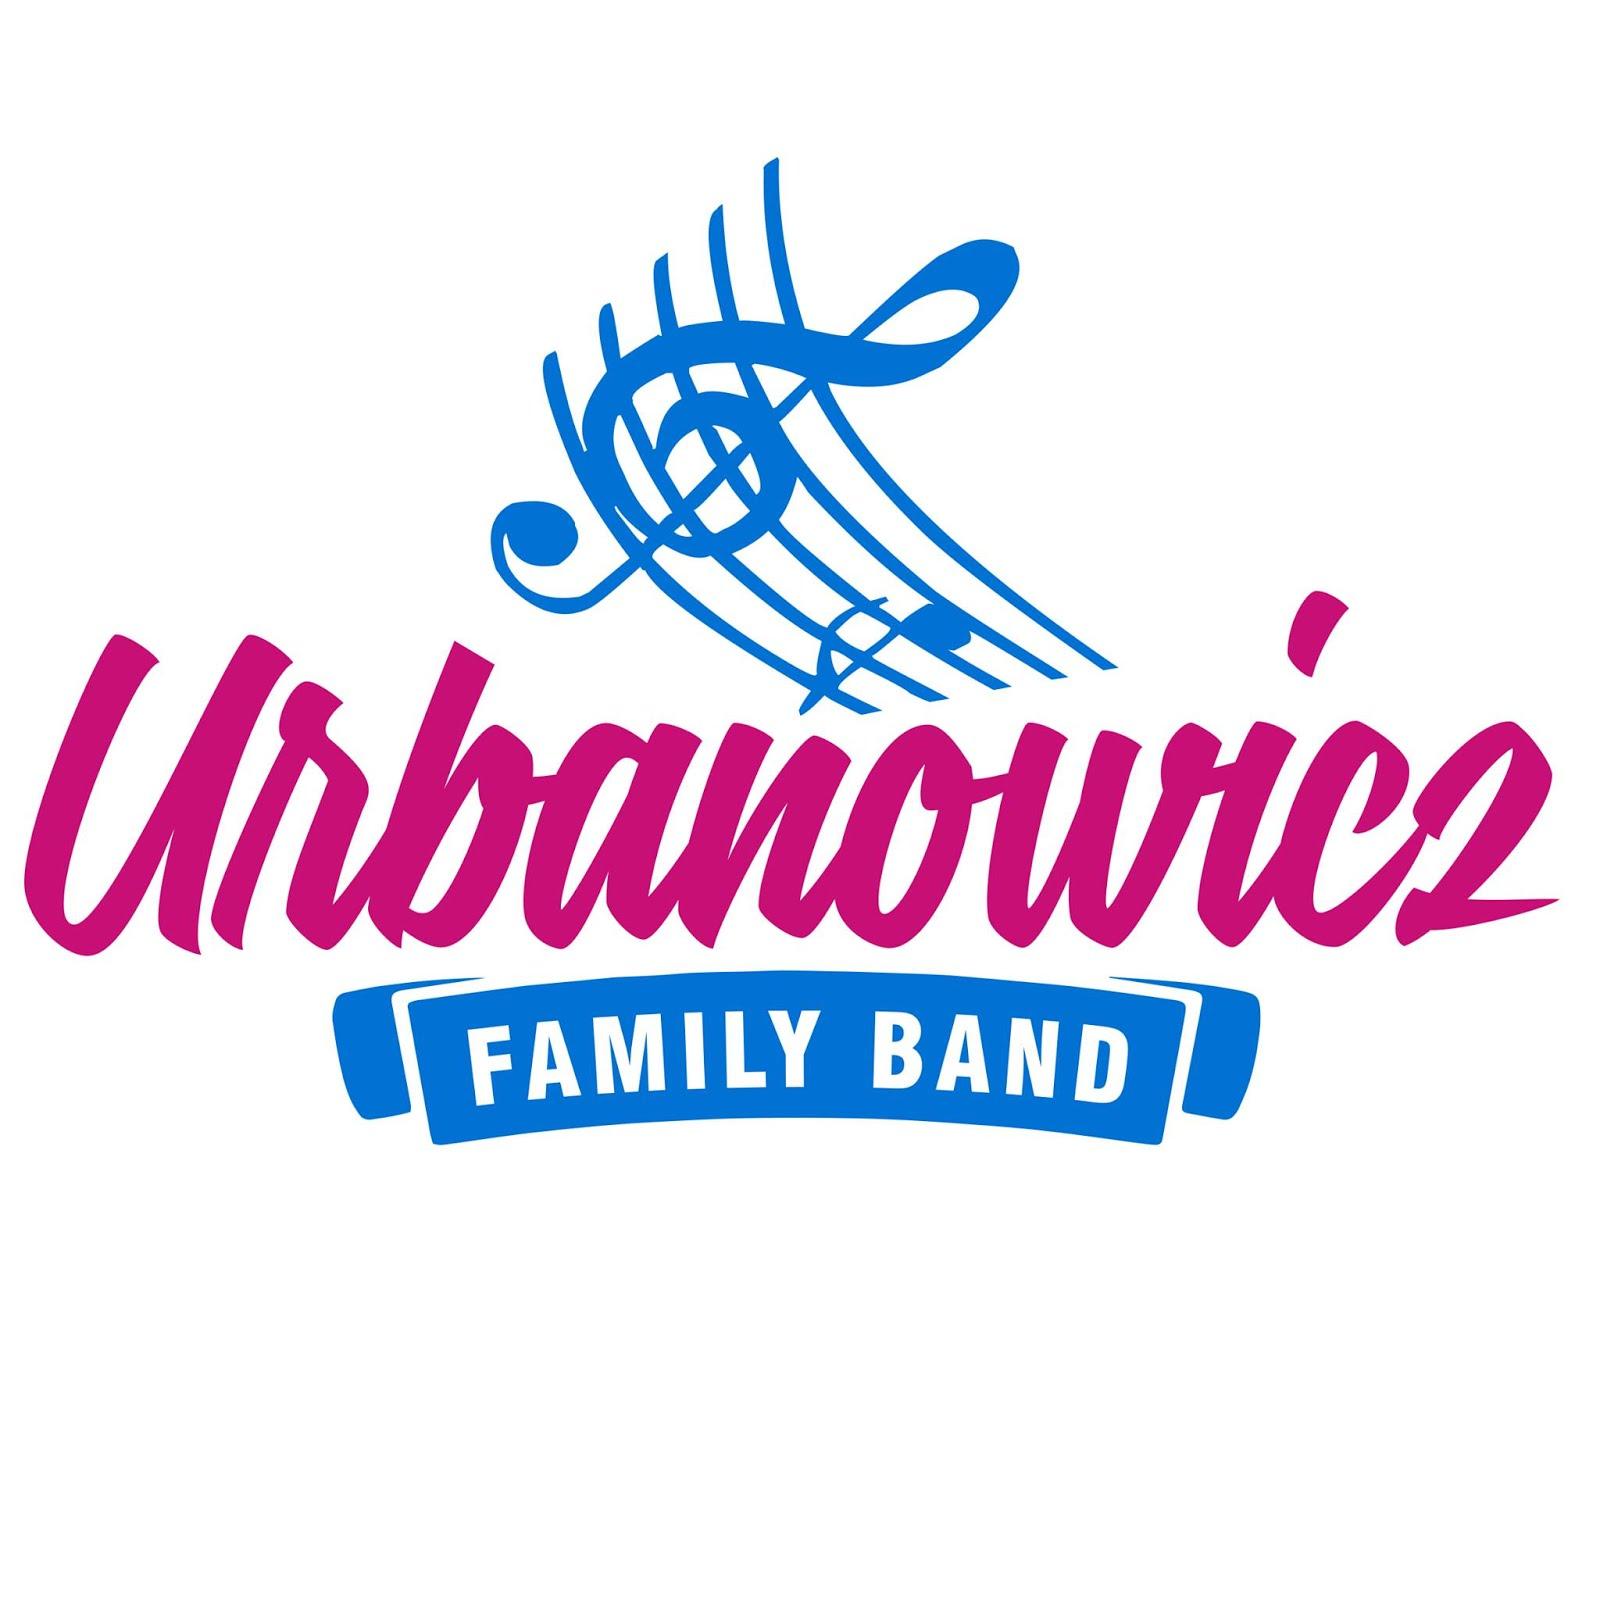 .....: Urbanowicz FAMILY Band :.....